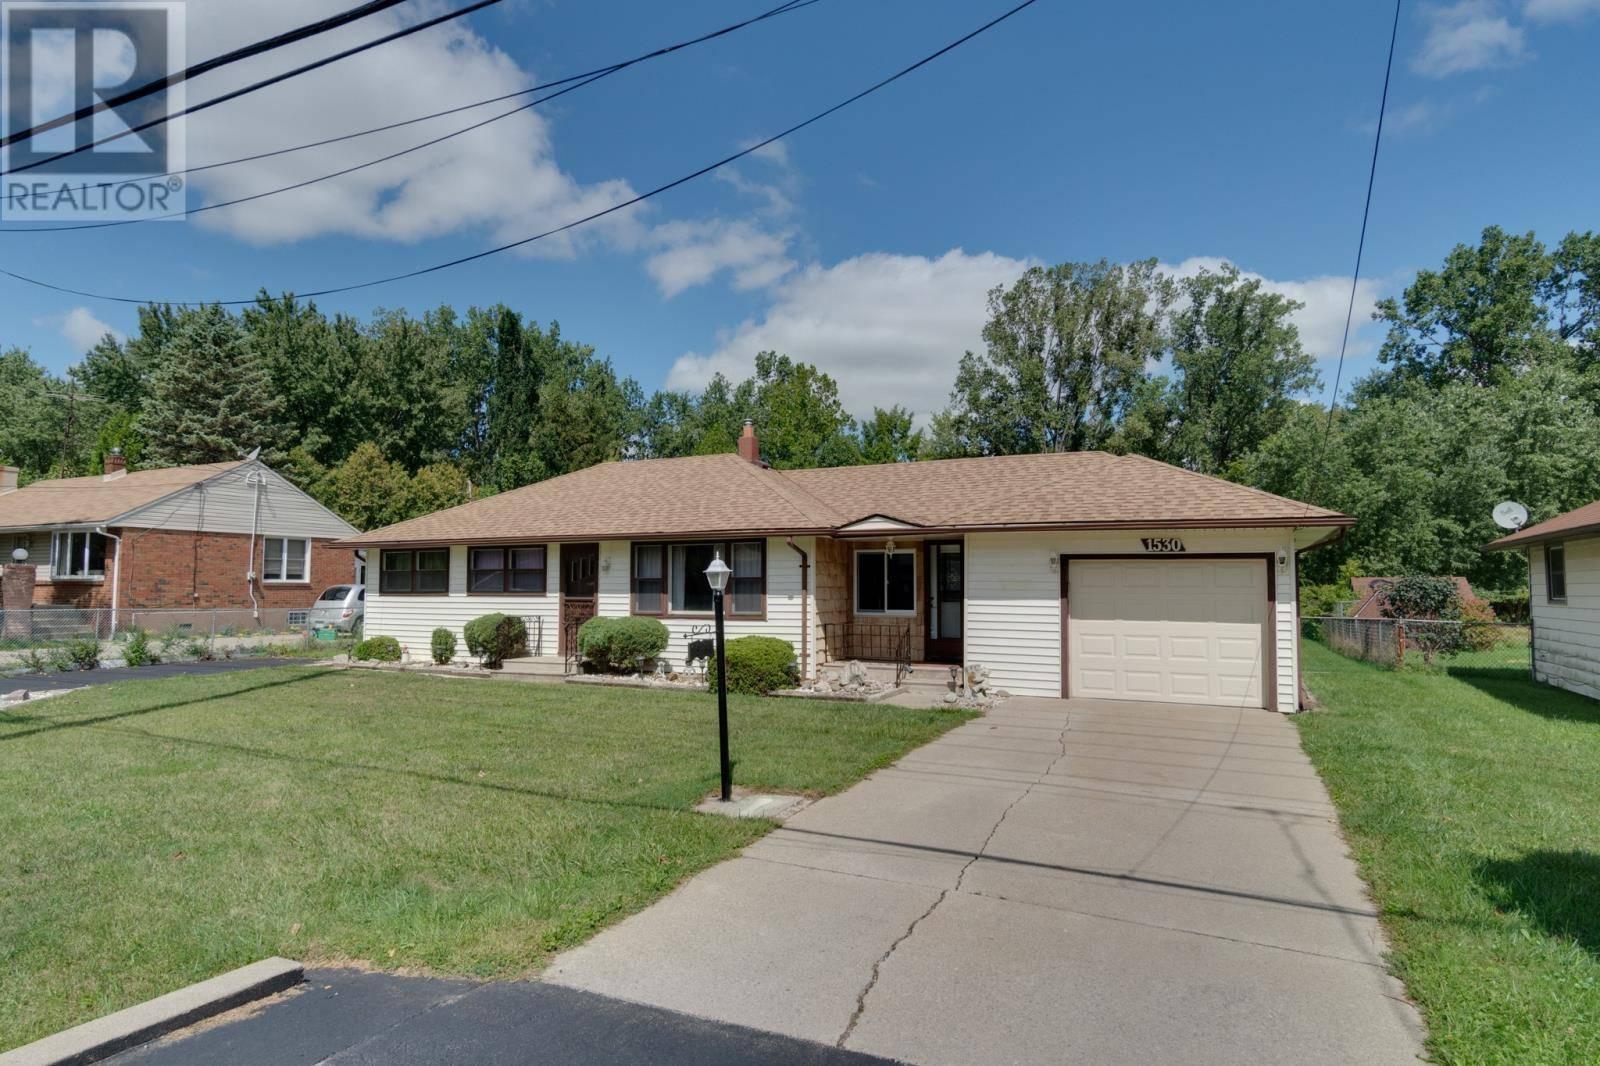 House for sale at 1530 Armanda  Windsor Ontario - MLS: 19024811